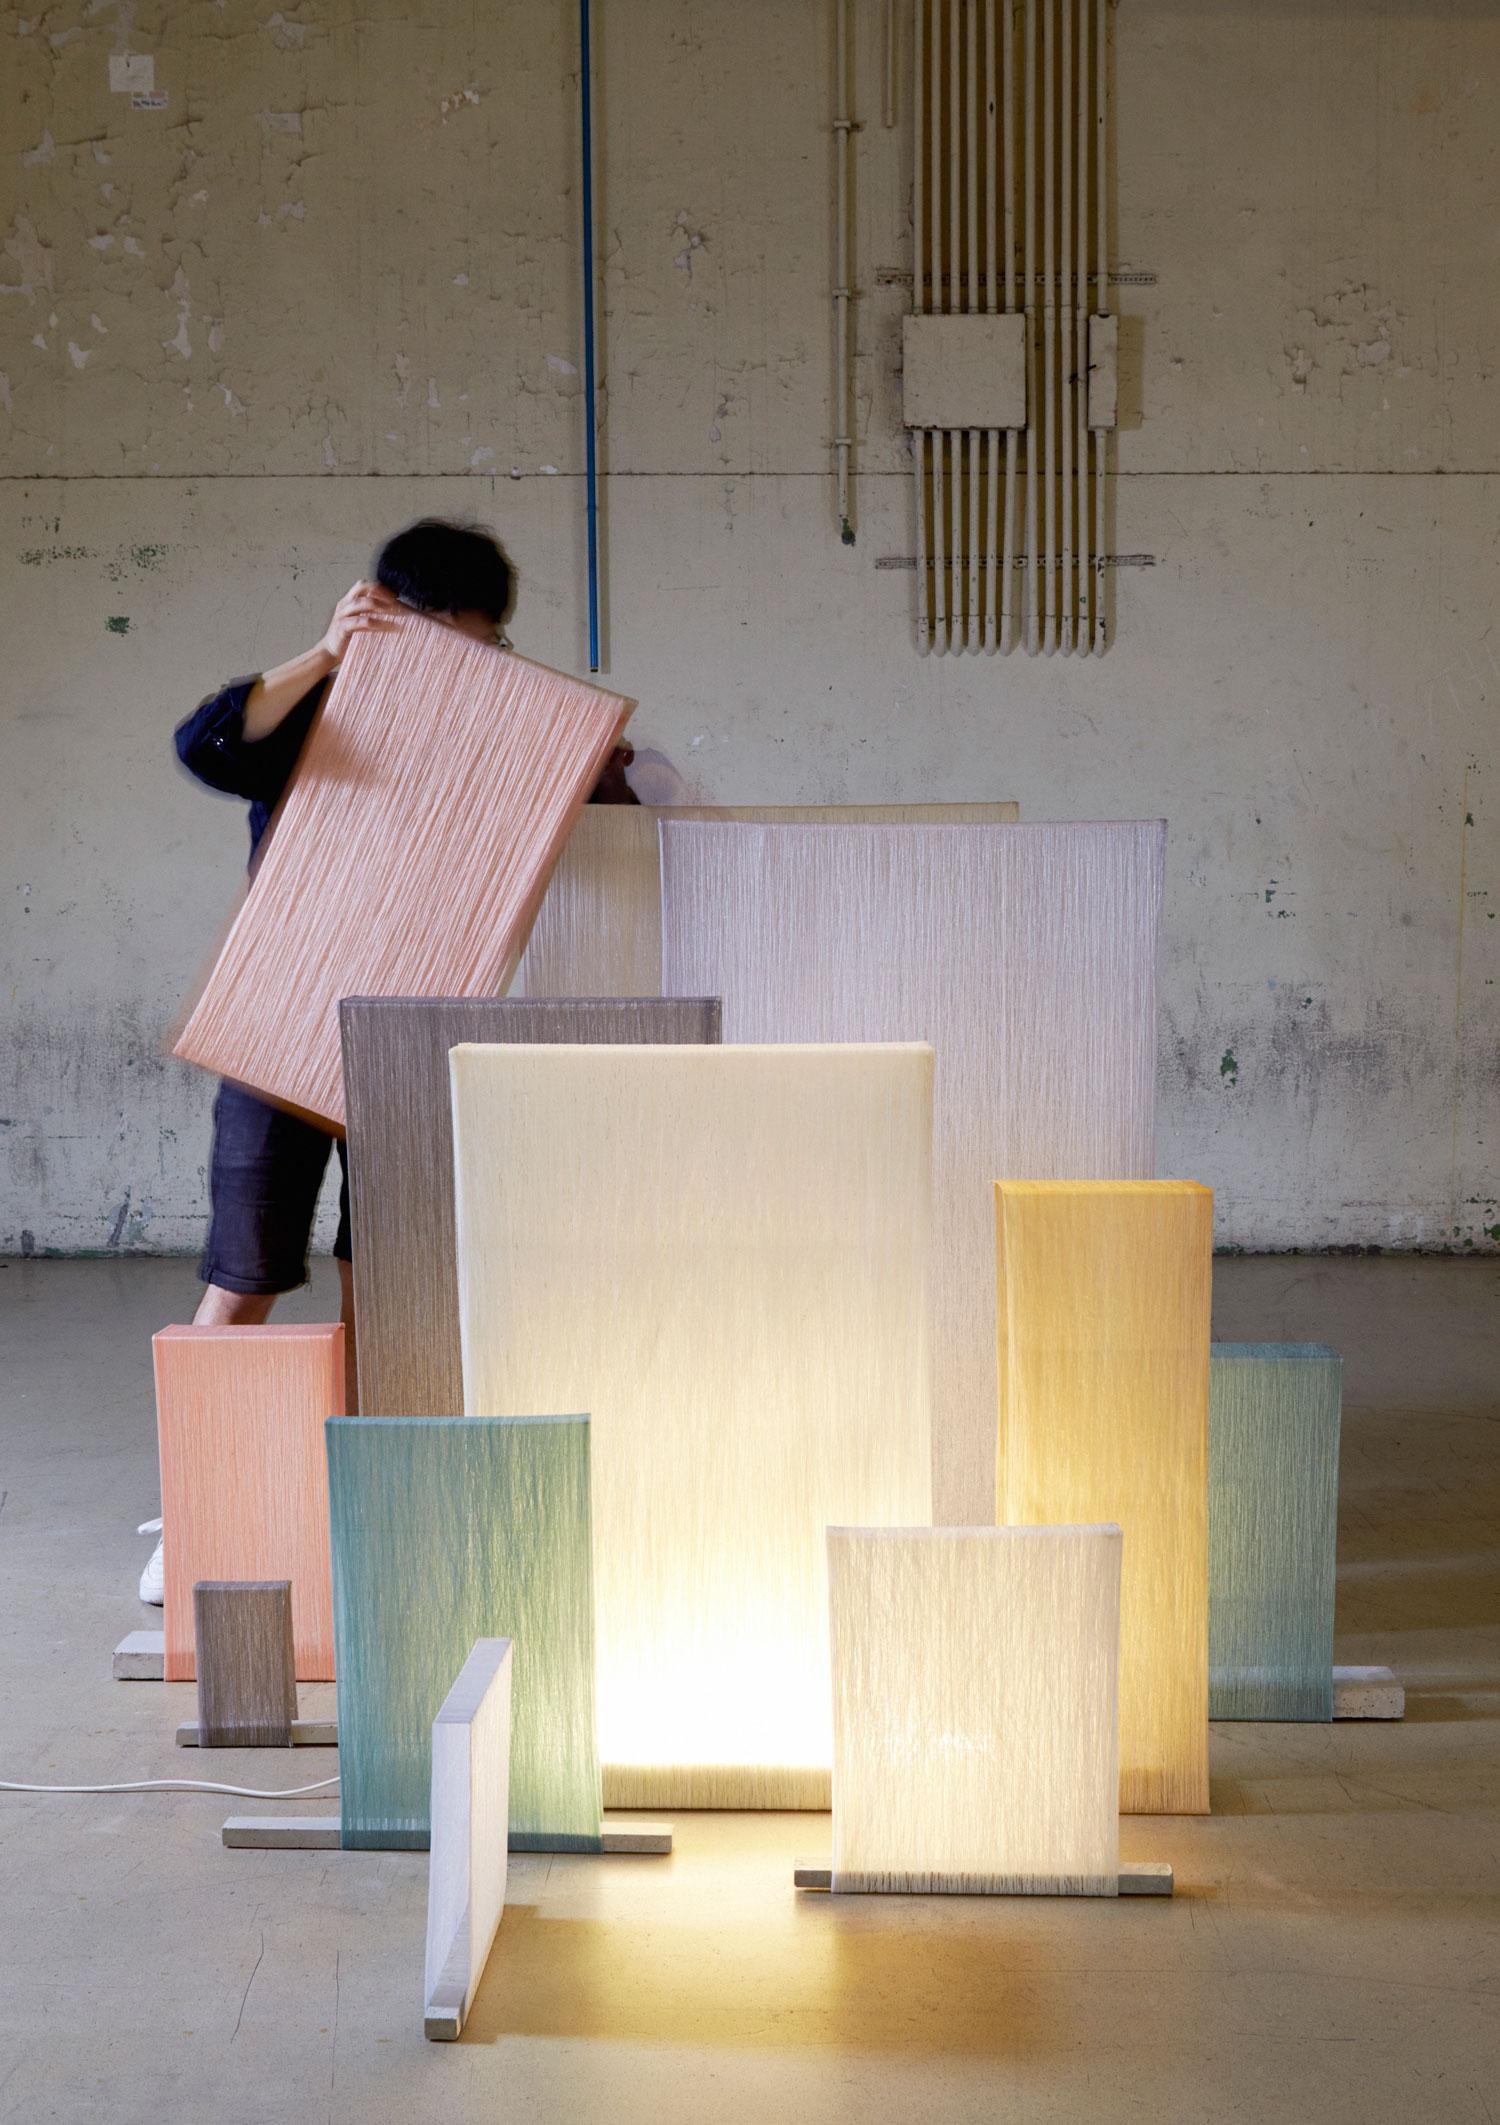 Design Academy Eindhoven 2016 Graduation Show, Junho Jeon | Yellowtrace